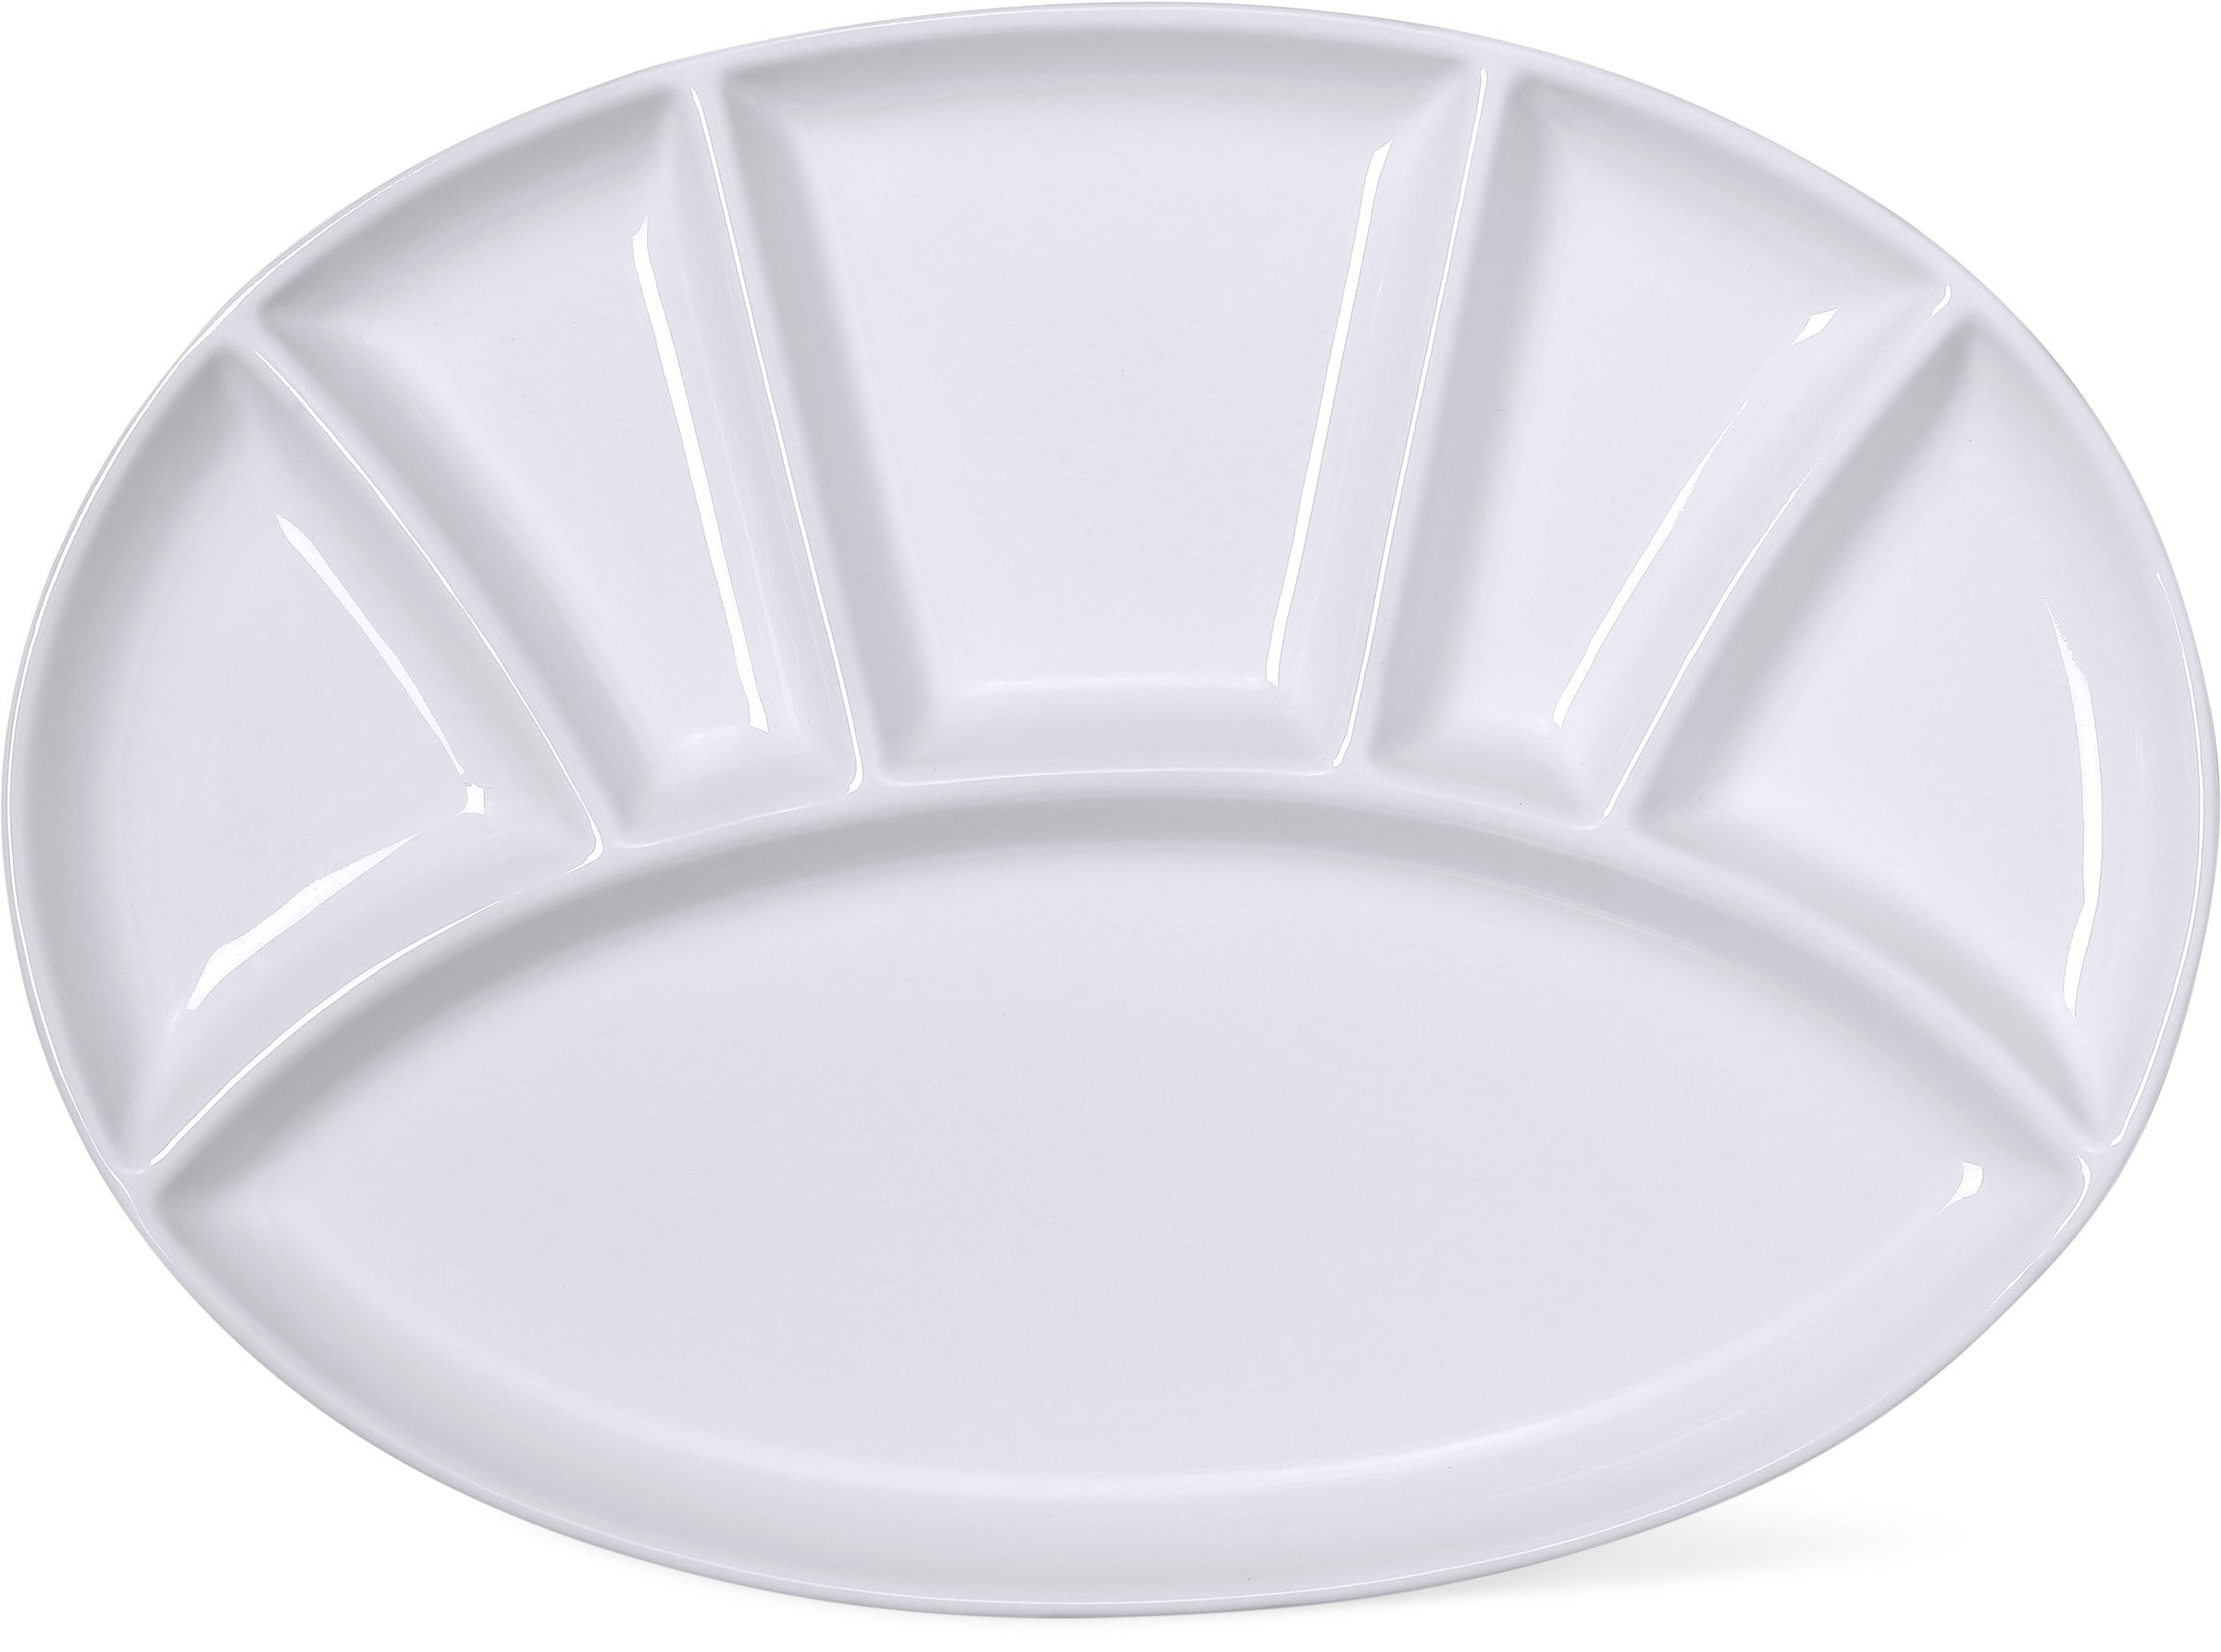 Cucina & Tavola Assiette fondue